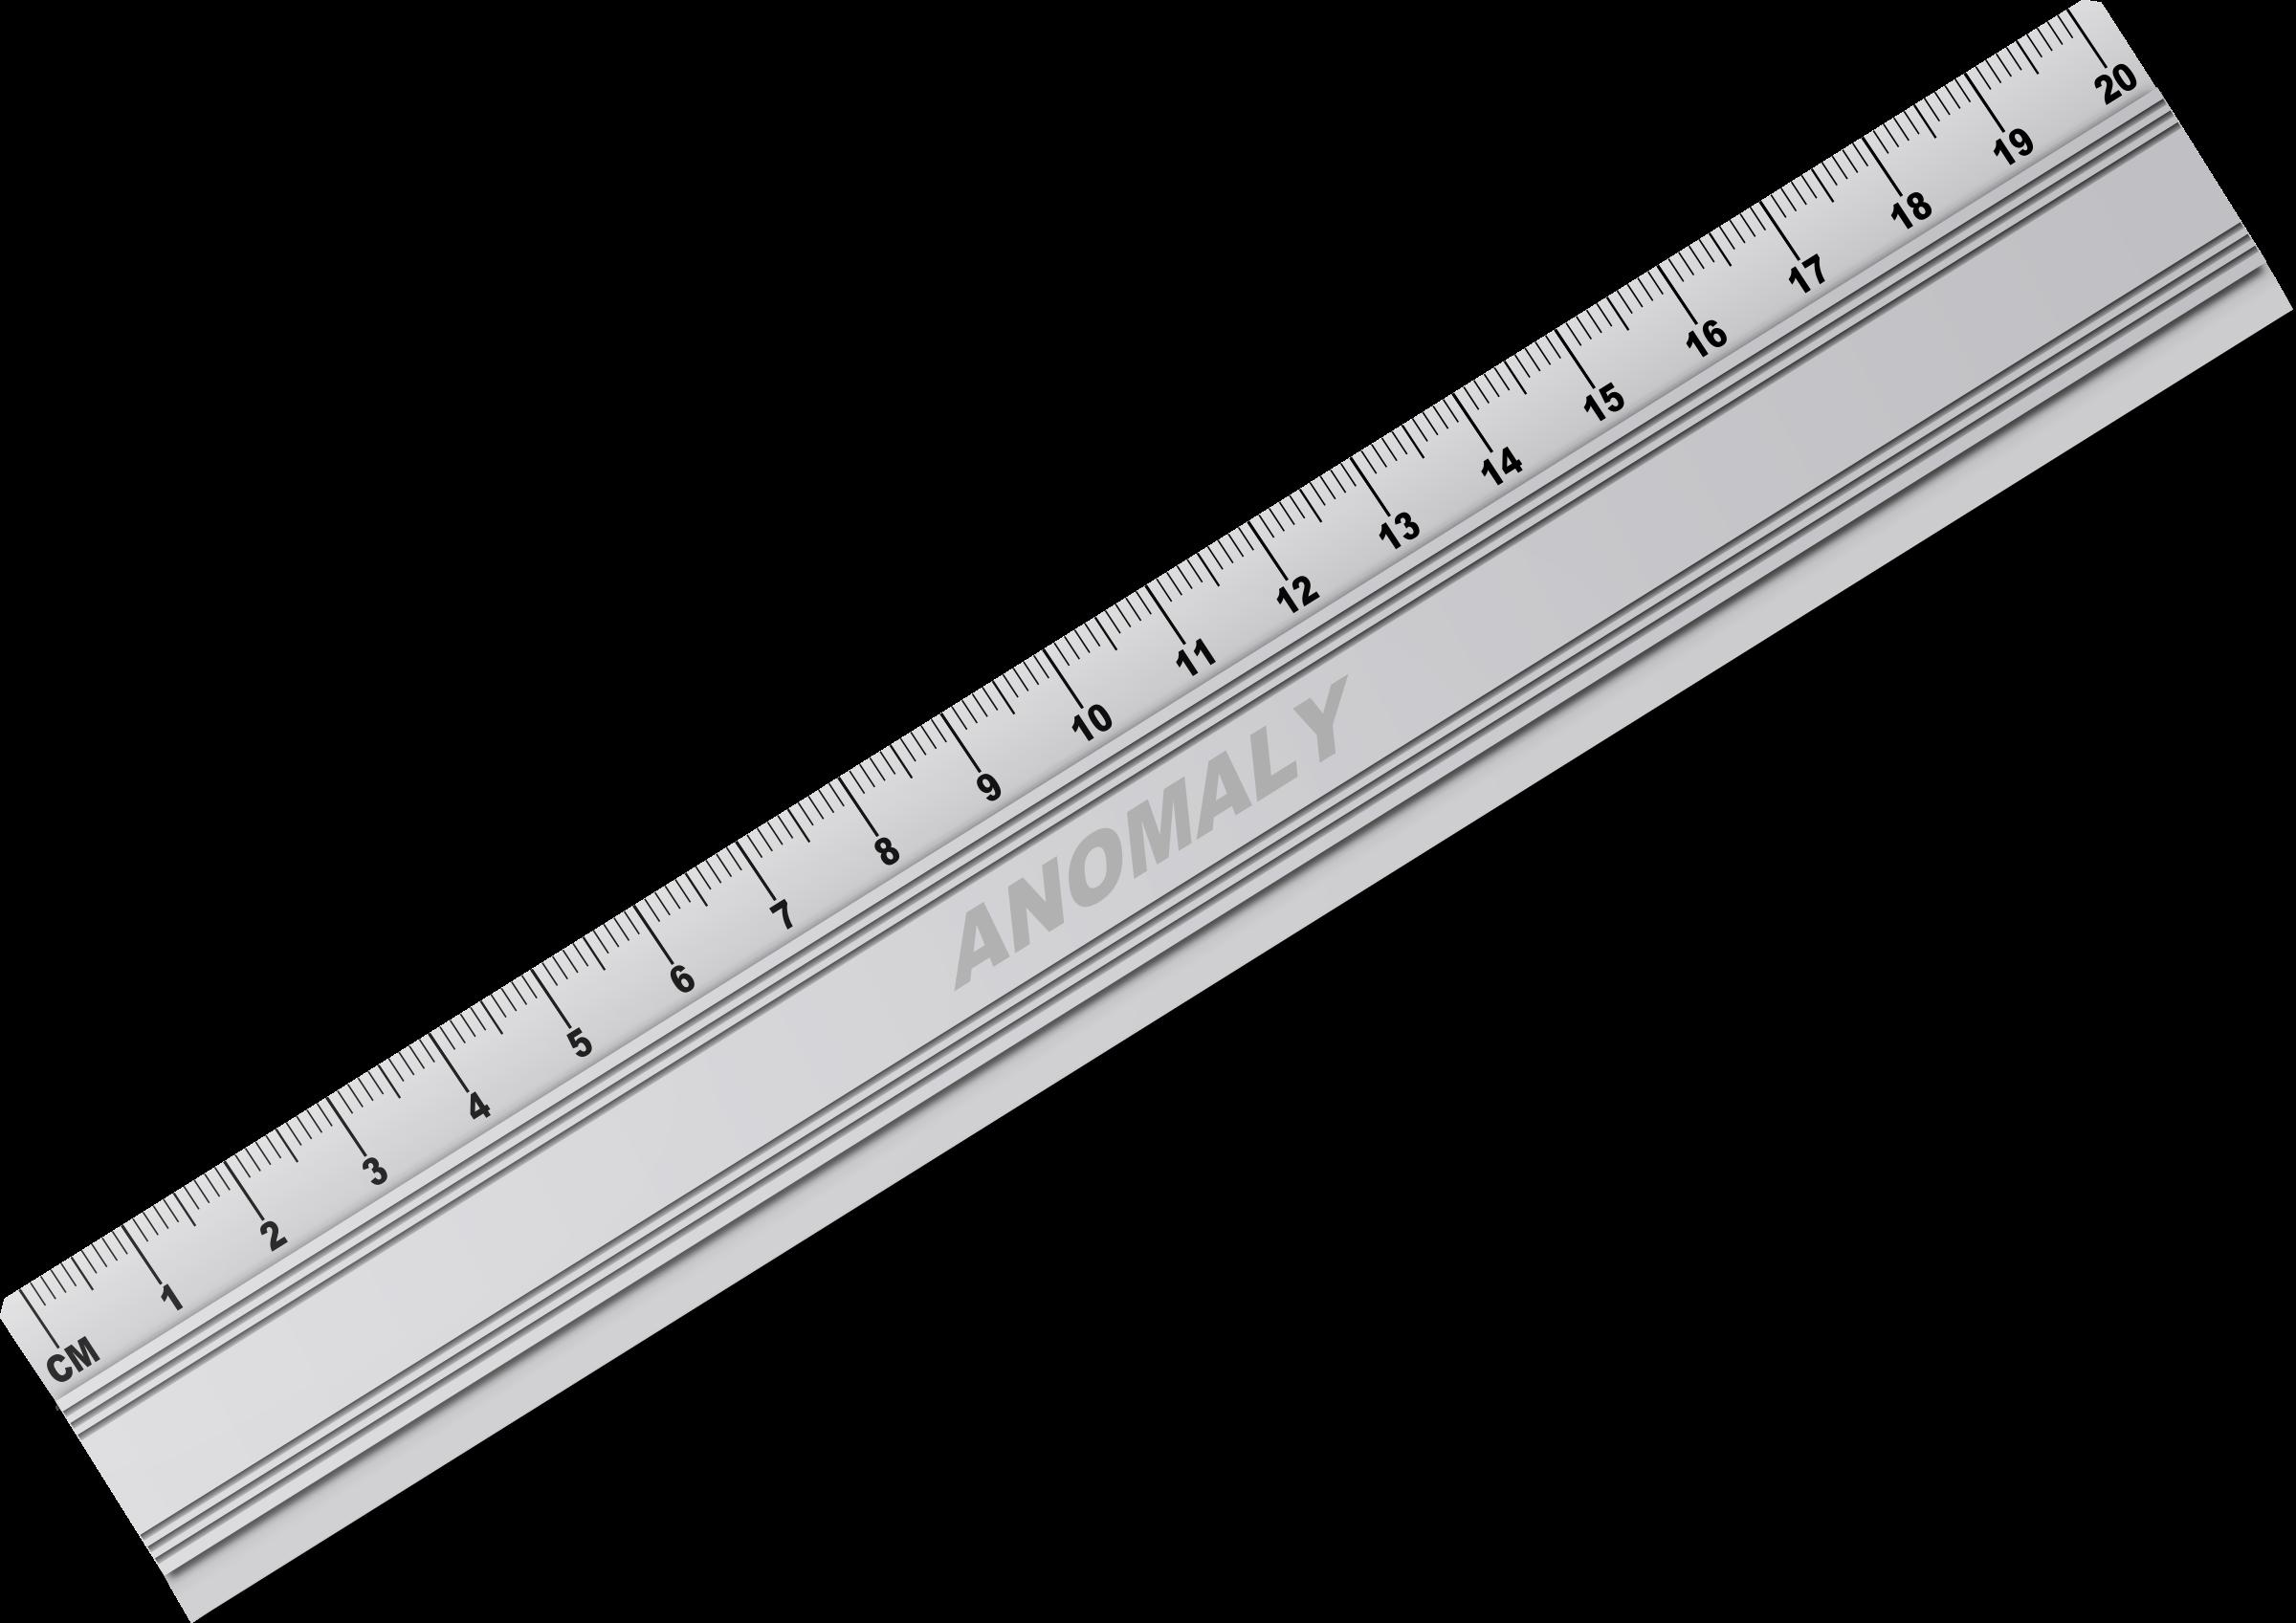 Download Ruler PNG Image.